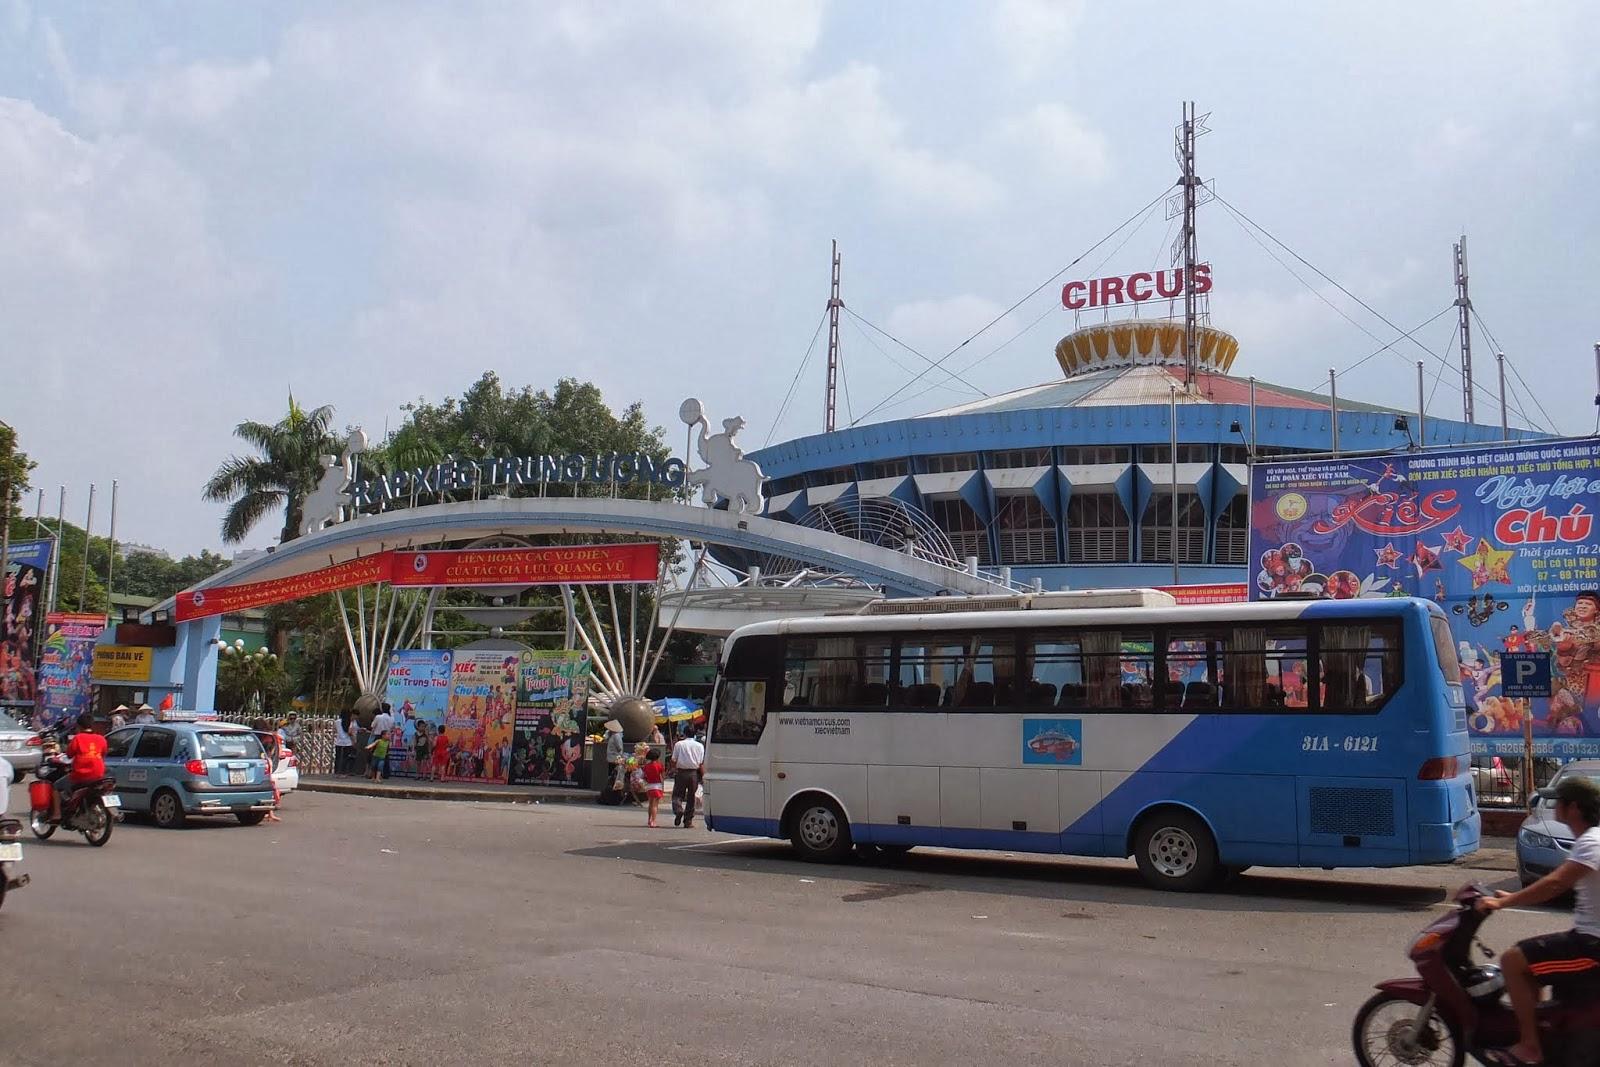 hanoi-circus ハノイサーカス